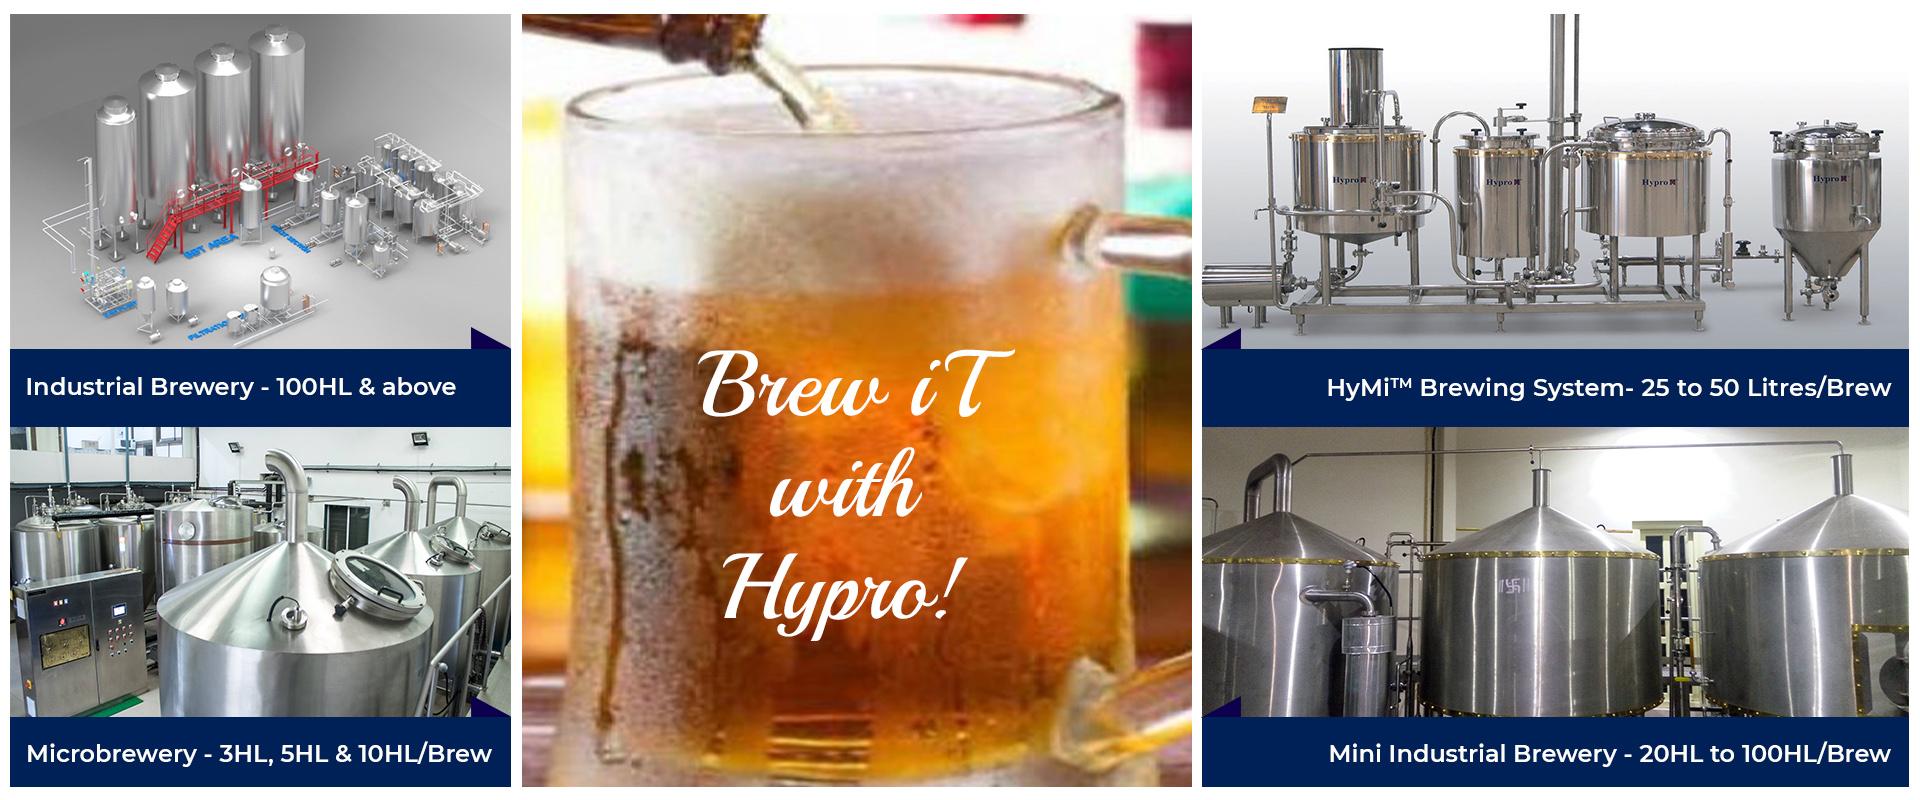 Brewing Hypro